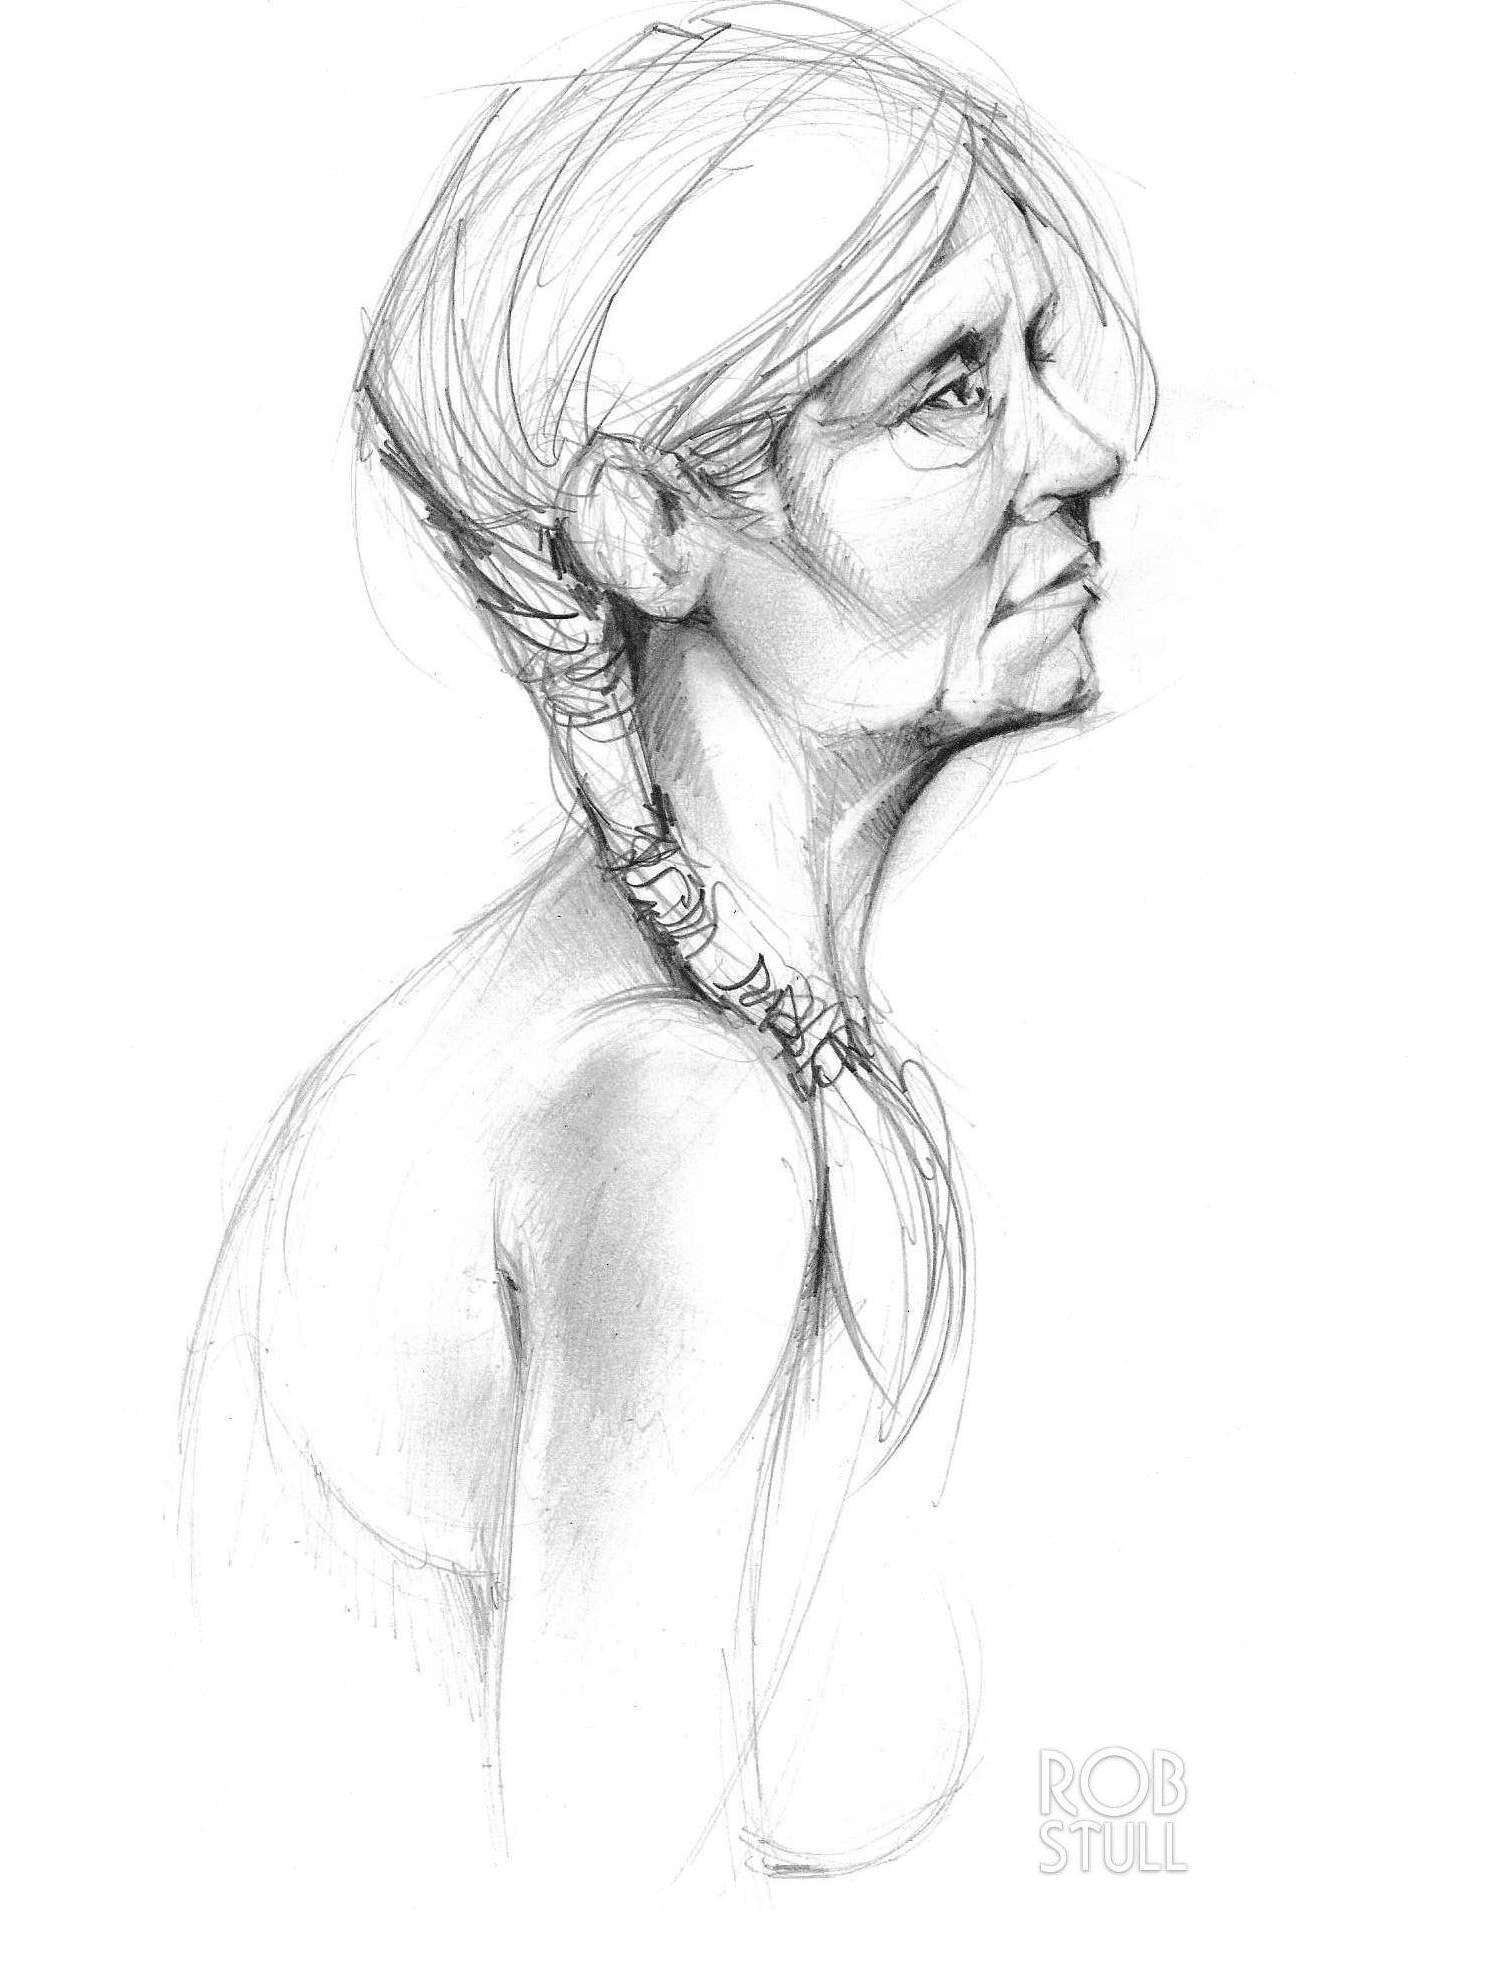 Rob Stull sketch study (2)